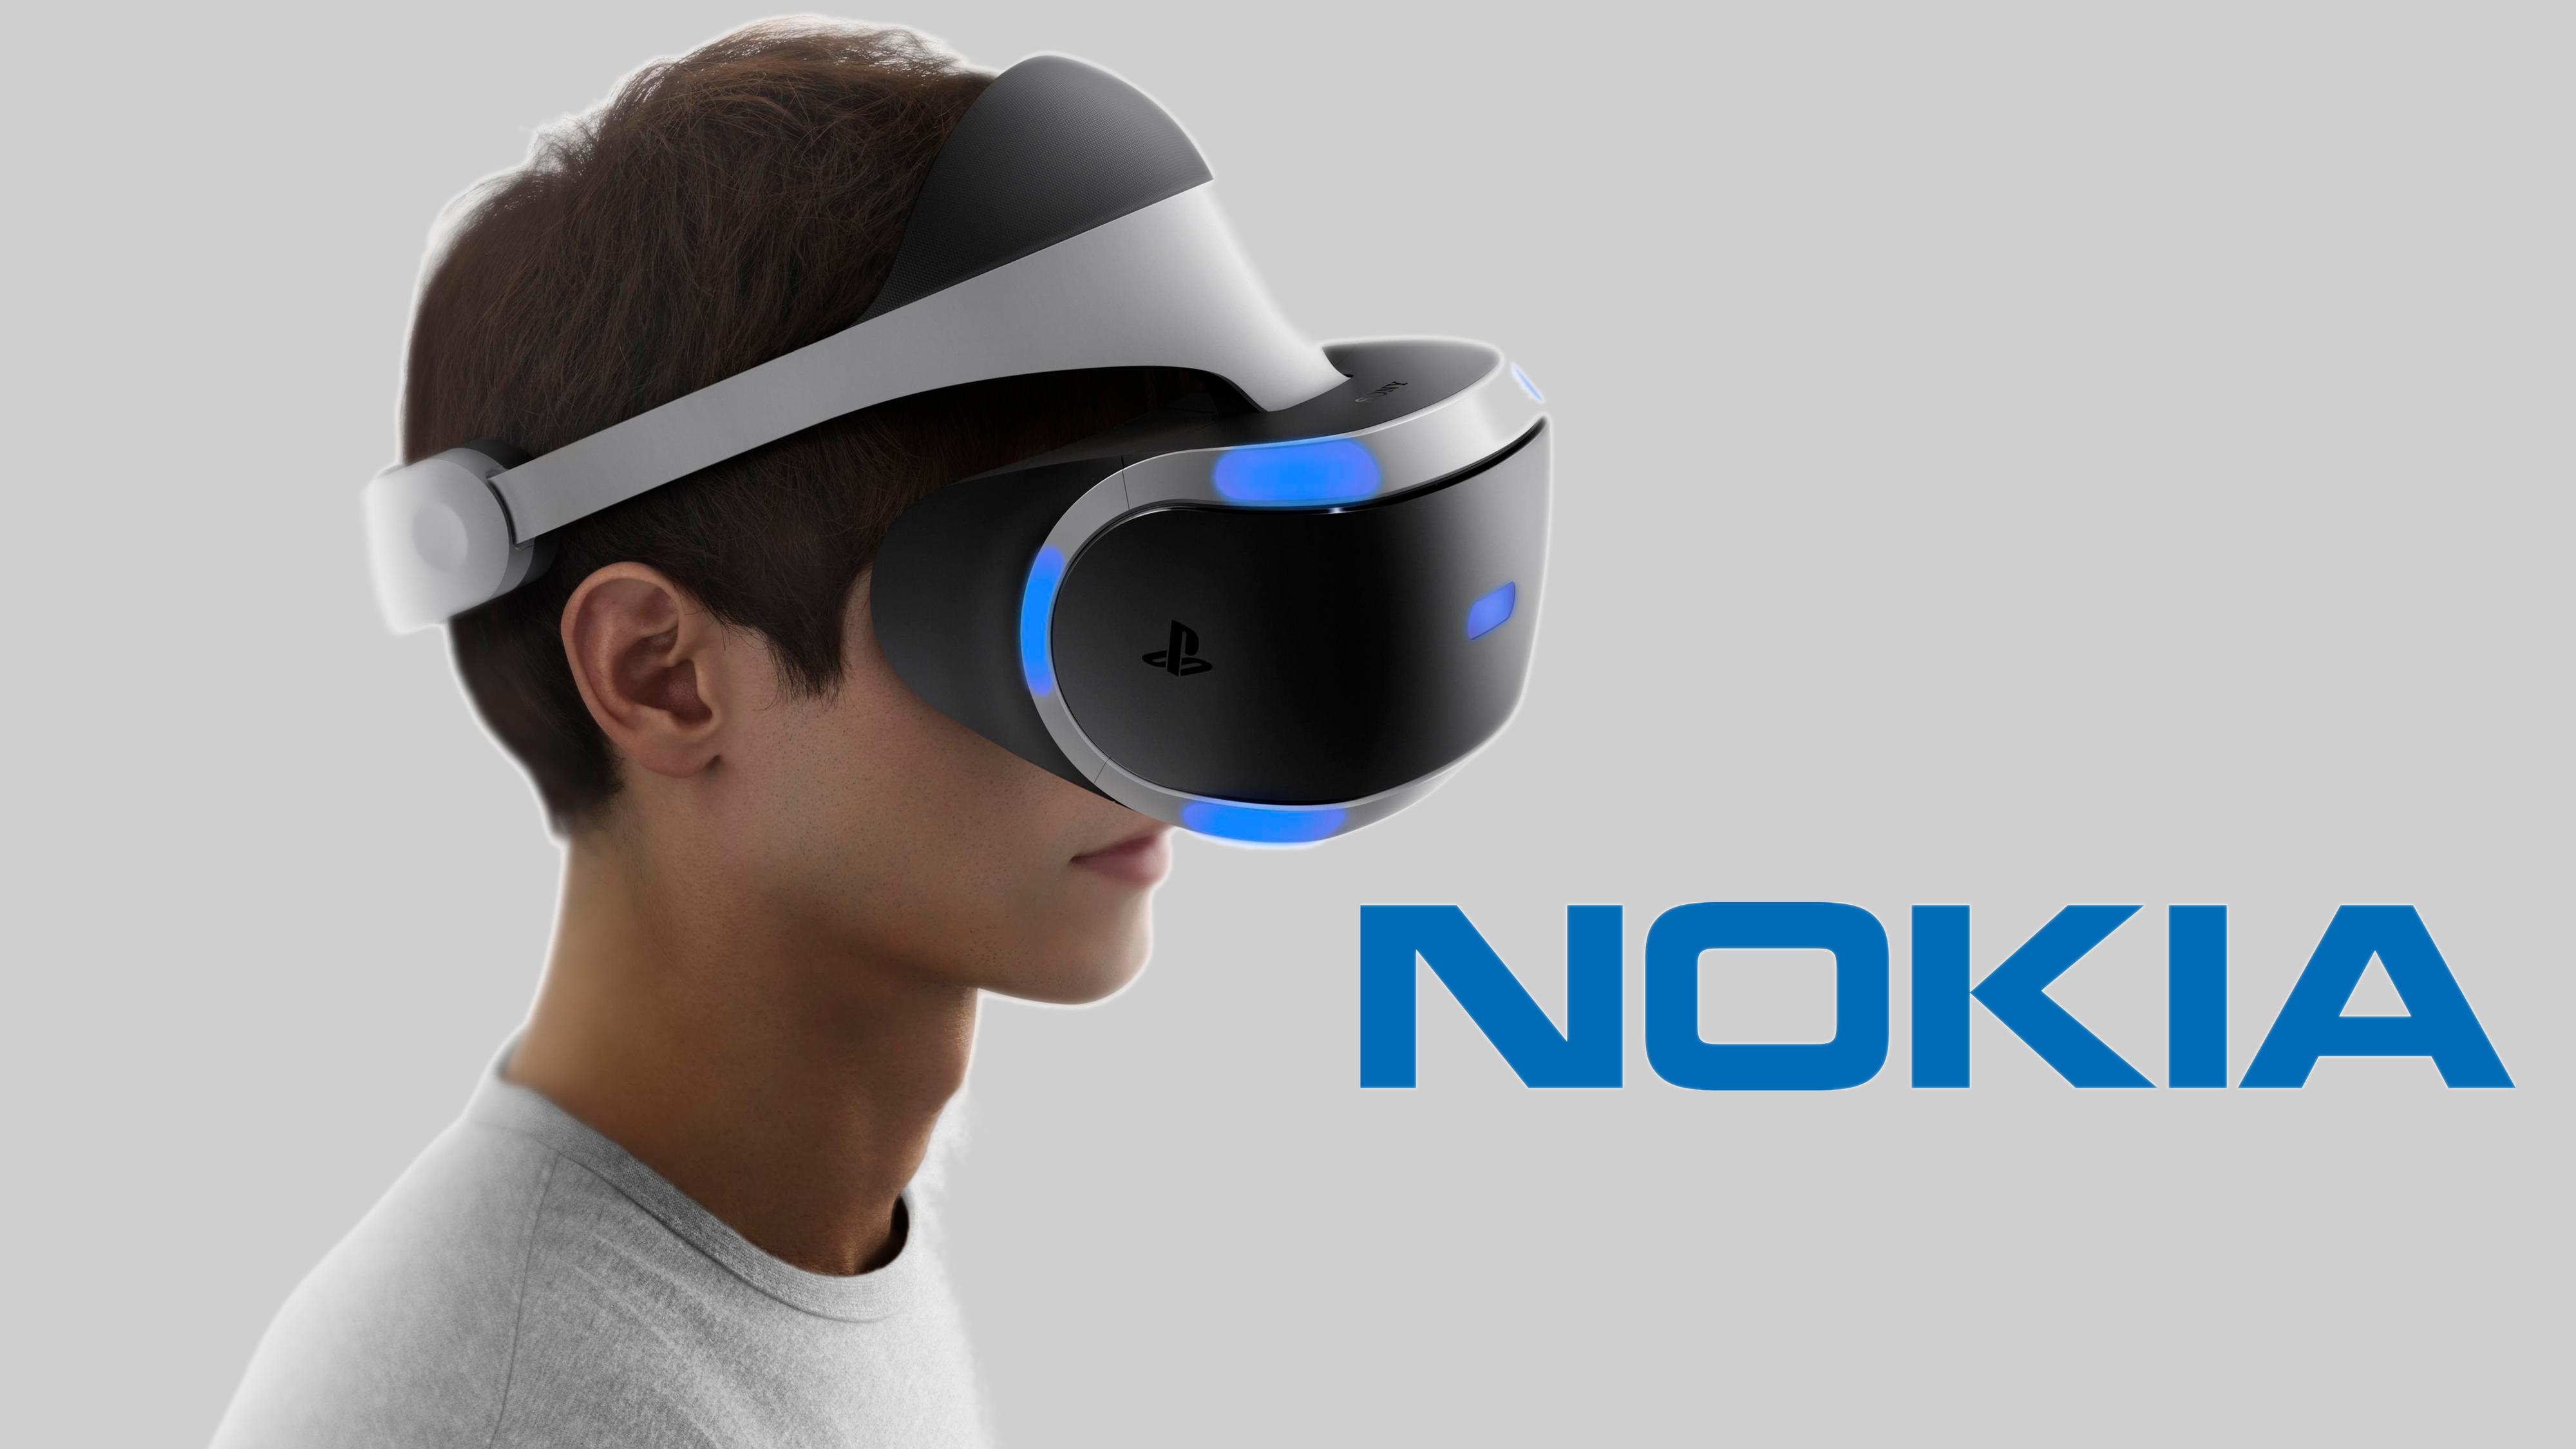 – Nokia skal vise frem et VR-produkt neste uke